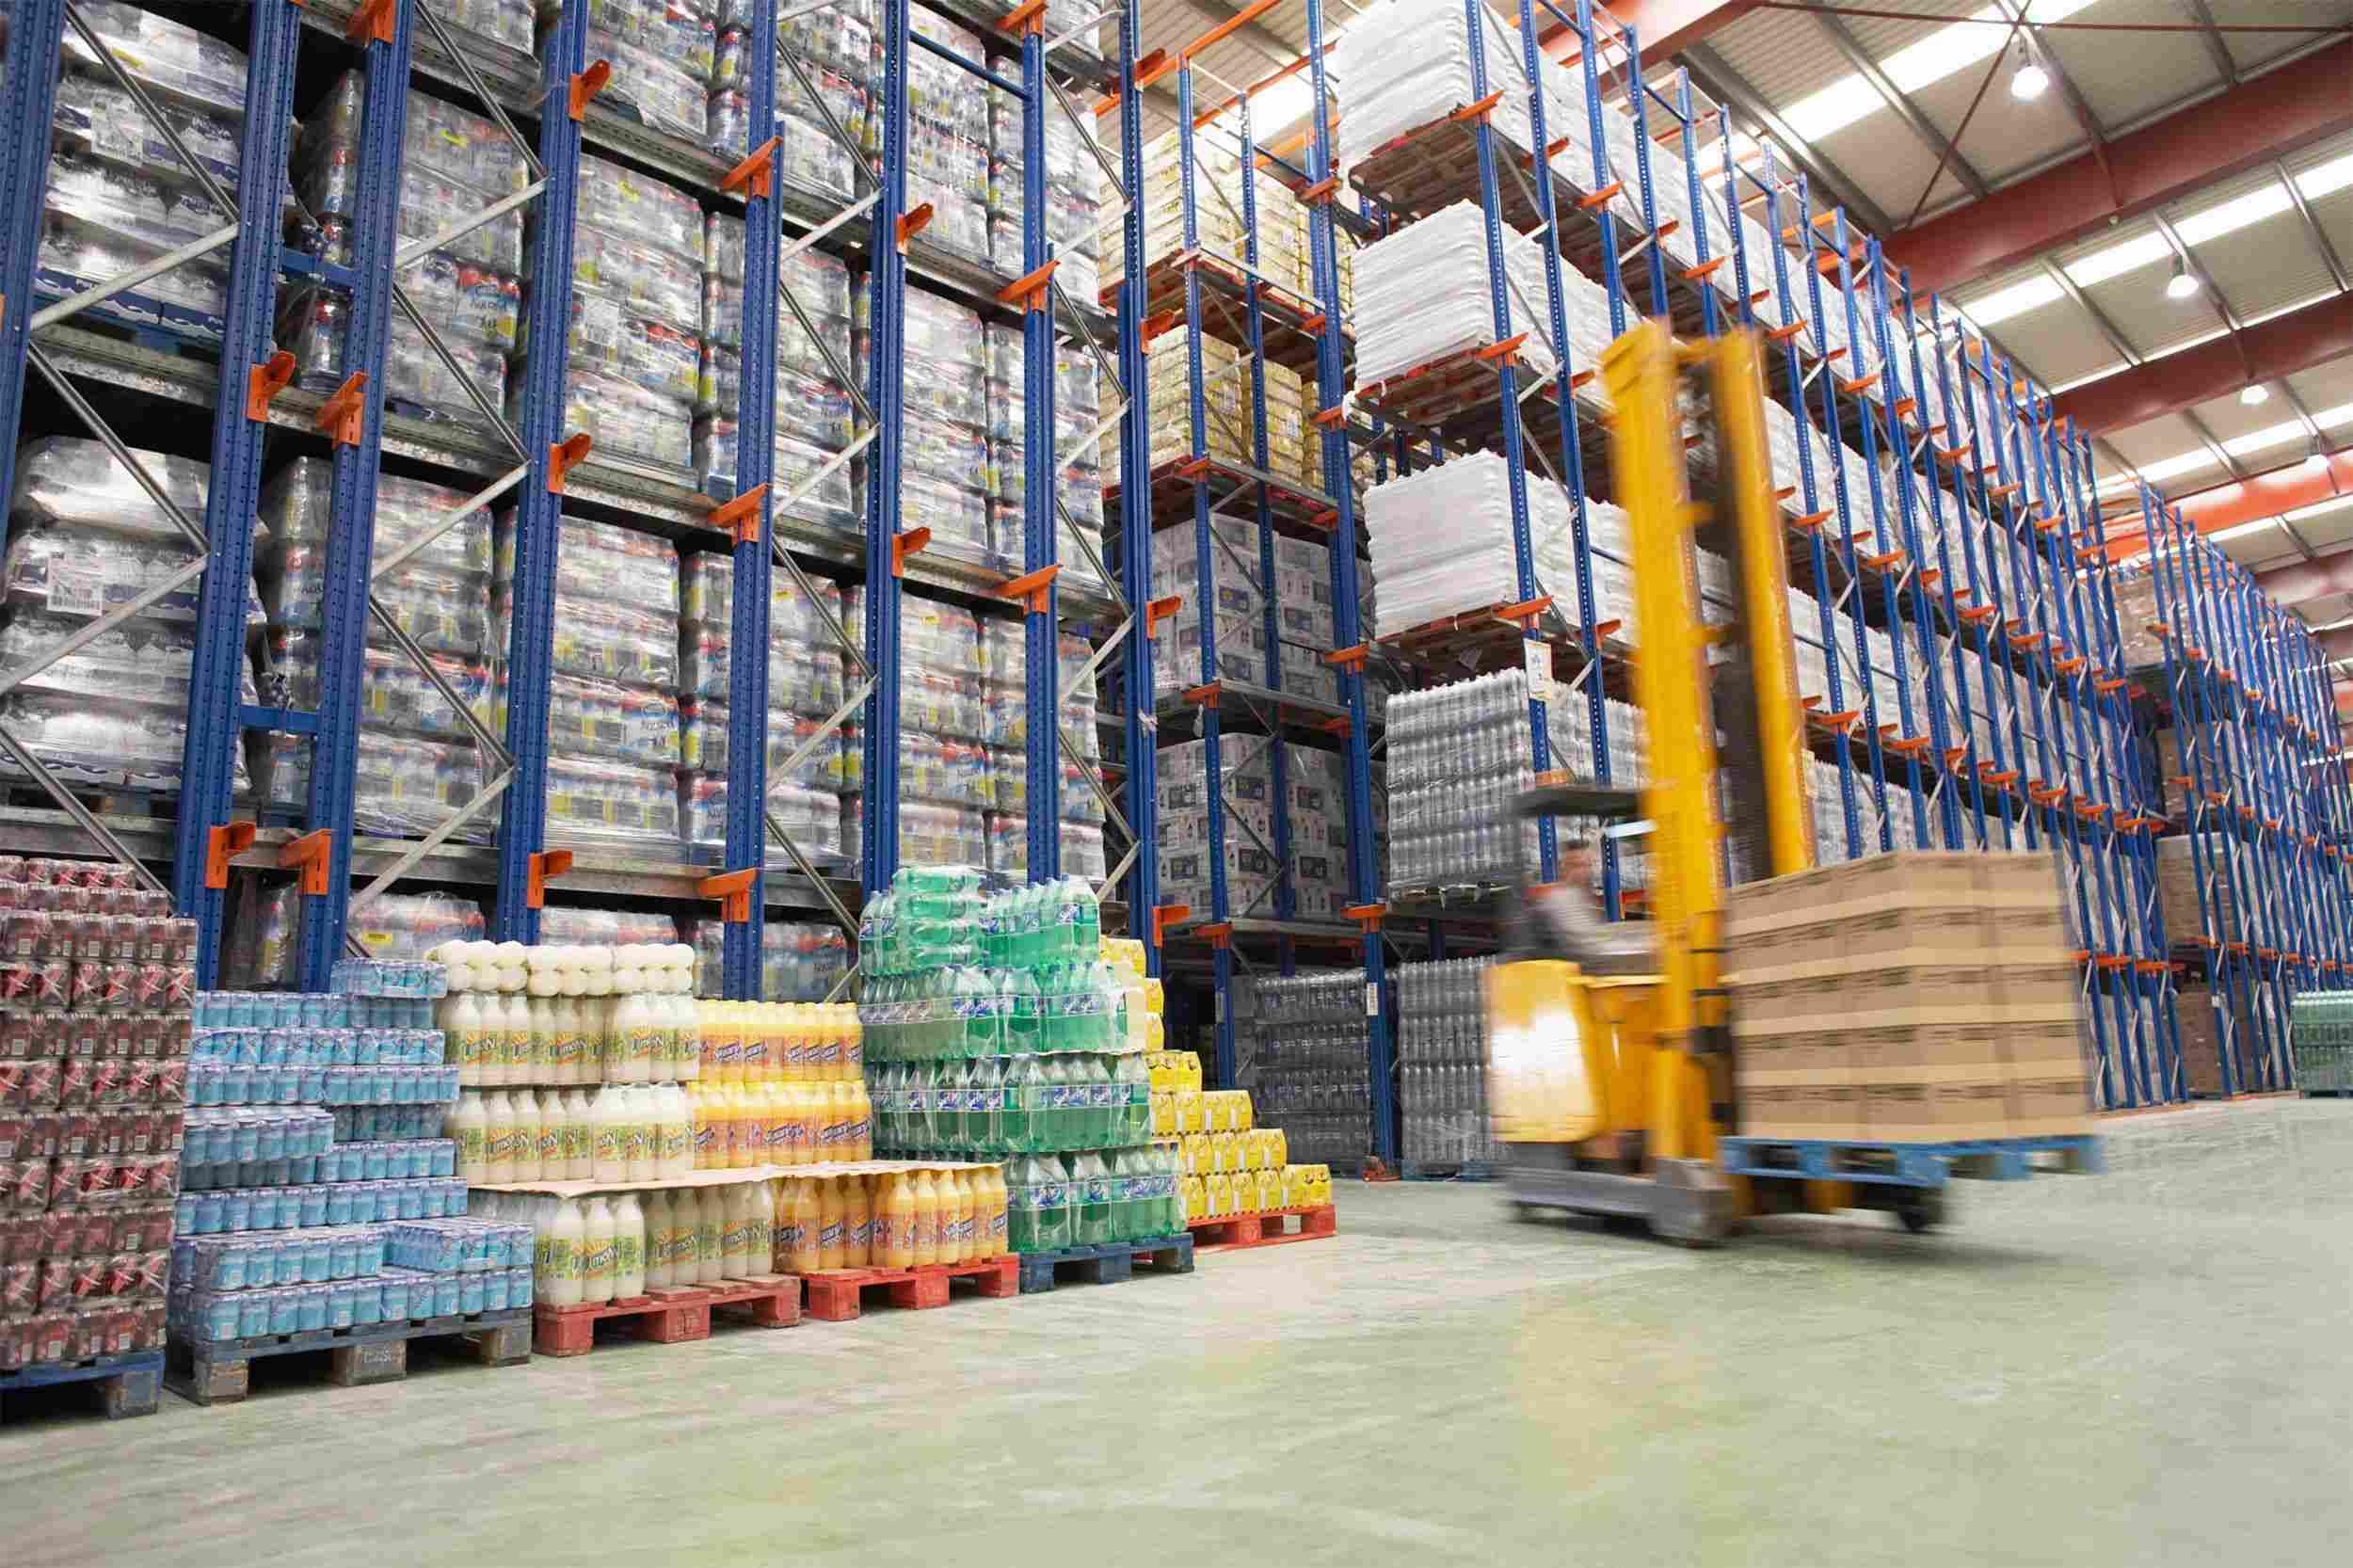 https://bhartiyalogistics.com/wp-content/uploads/2015/09/Warehouse-and-lifter-1.jpg